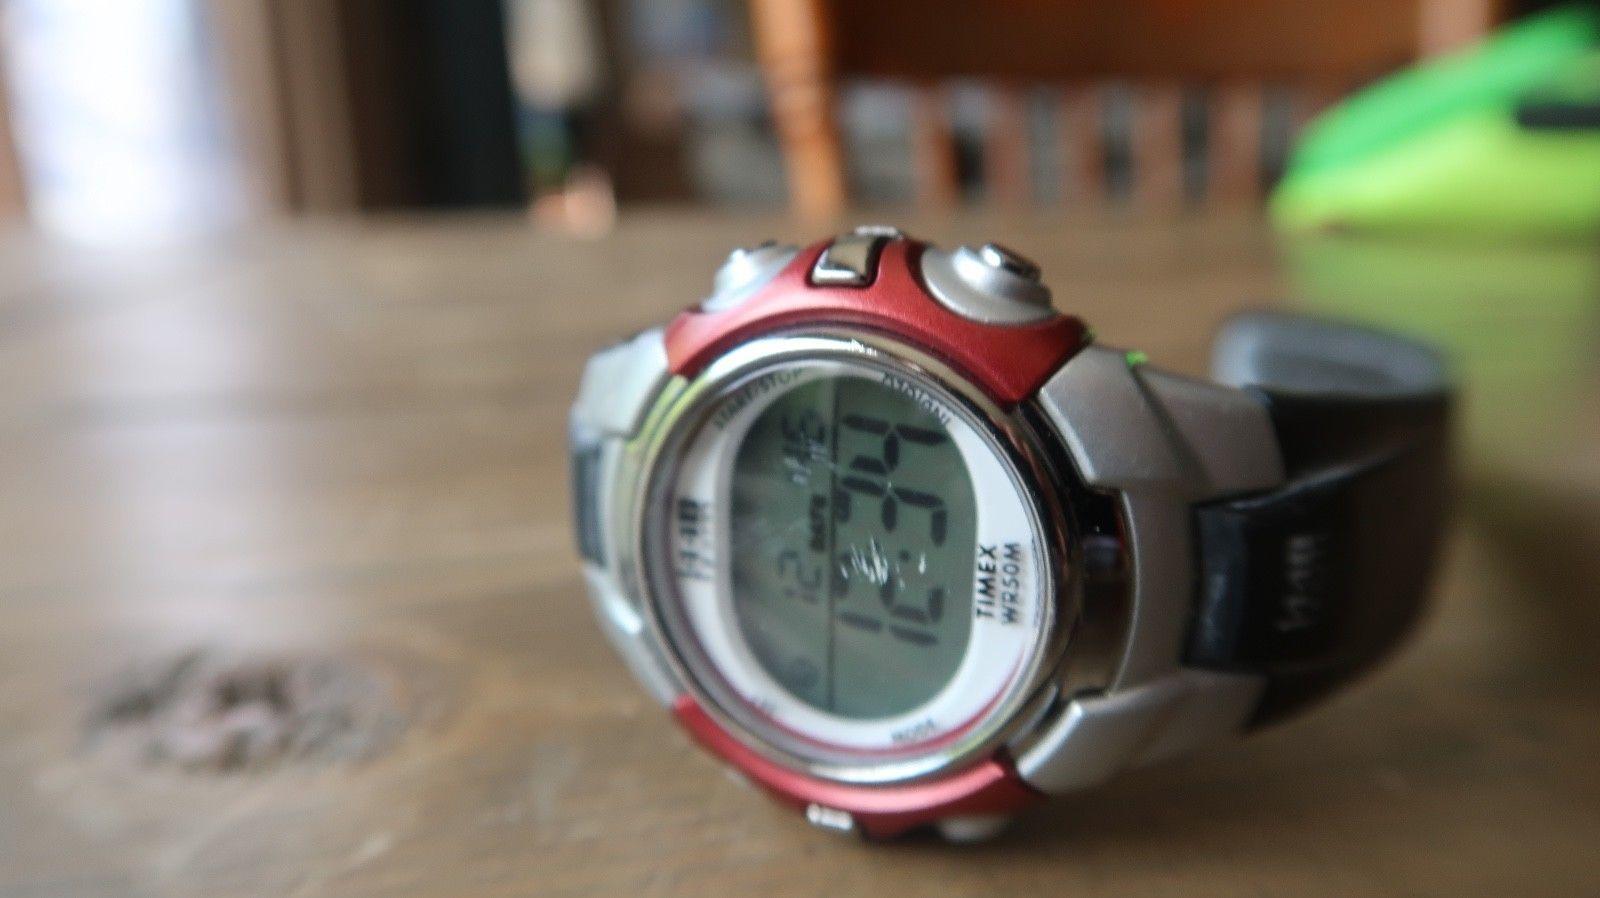 99f955cb9 Women's Timex 1440 Sports Watch 33mm and 50 similar items. S l1600